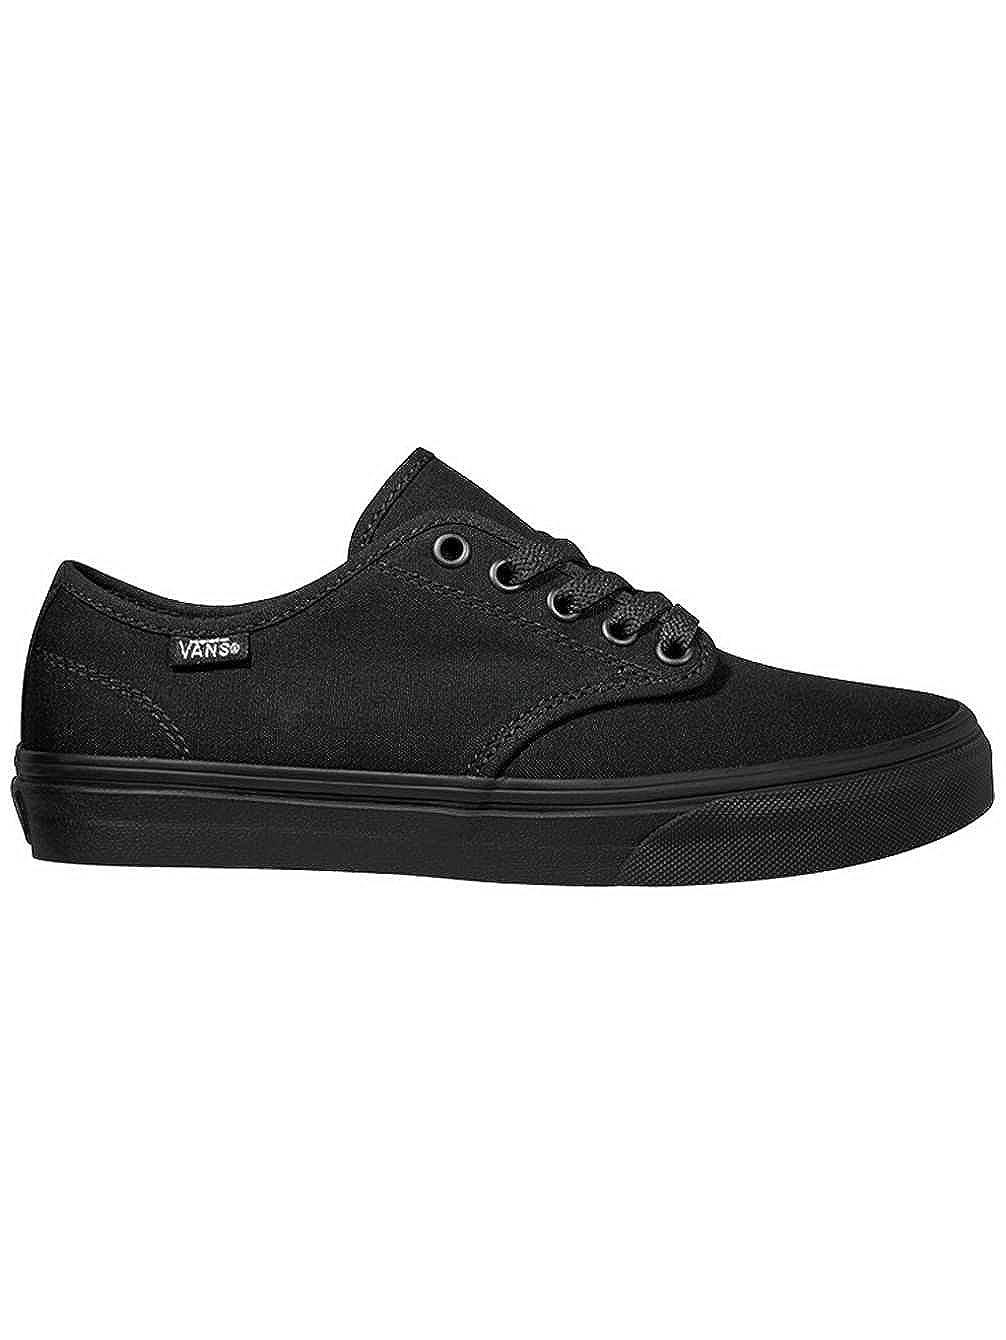 Vans schwarz-schwarz Damen Camden Stripe Sneaker schwarz-schwarz Vans 0d15db